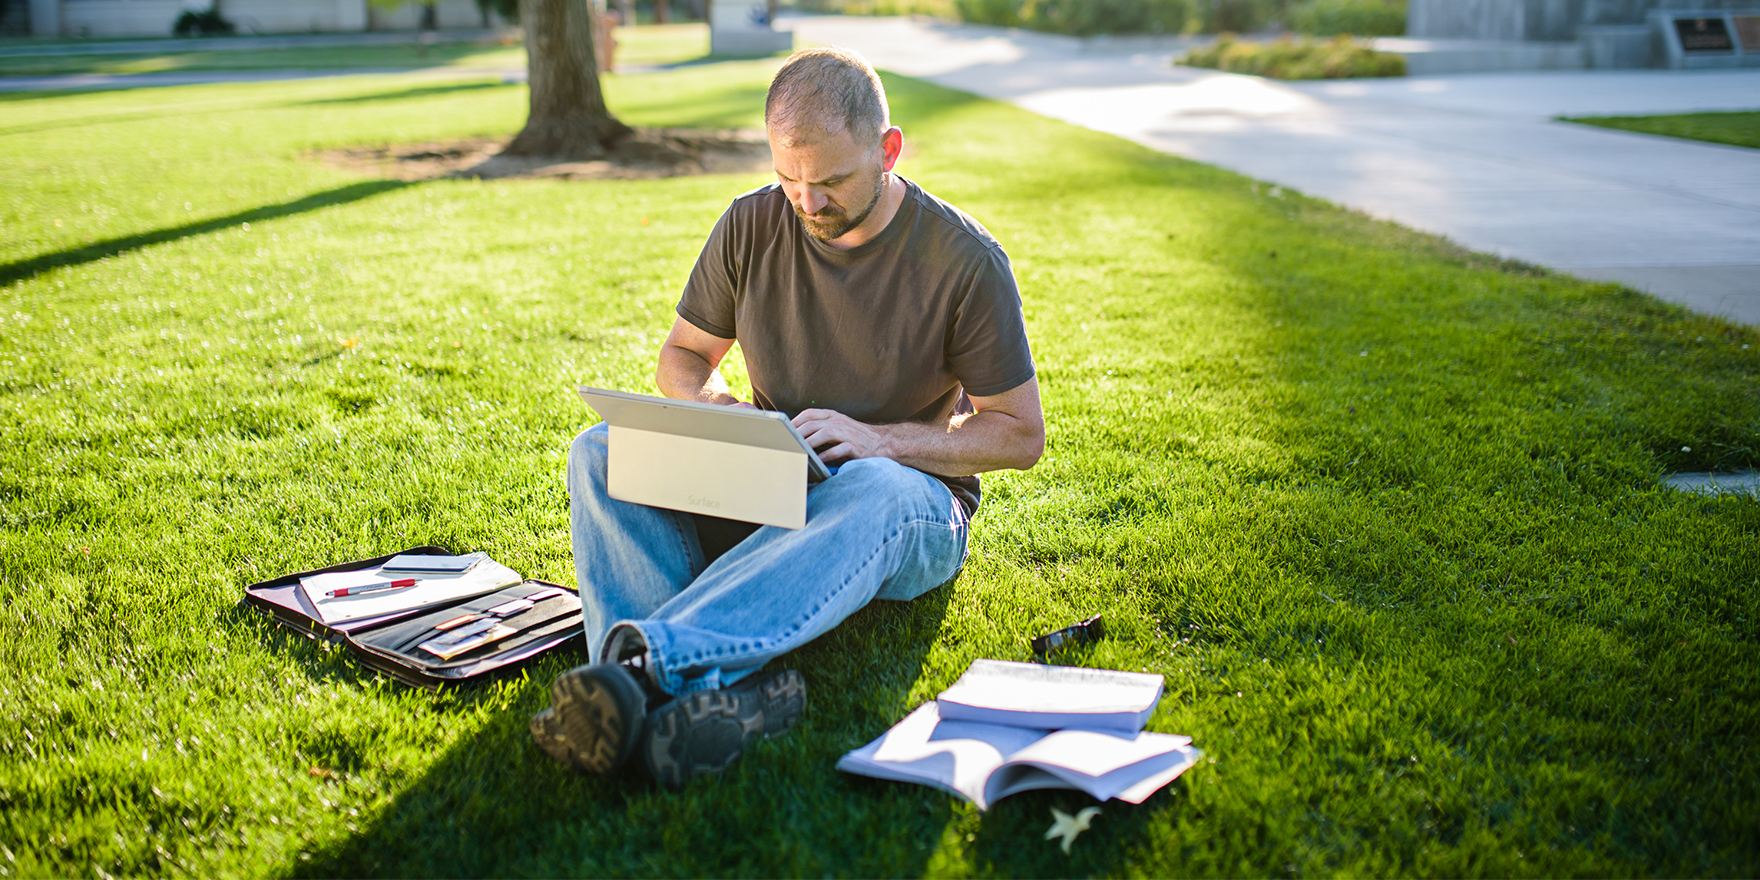 How Comcast's Internet Essentials Program Helps Bridge the Digital Divide